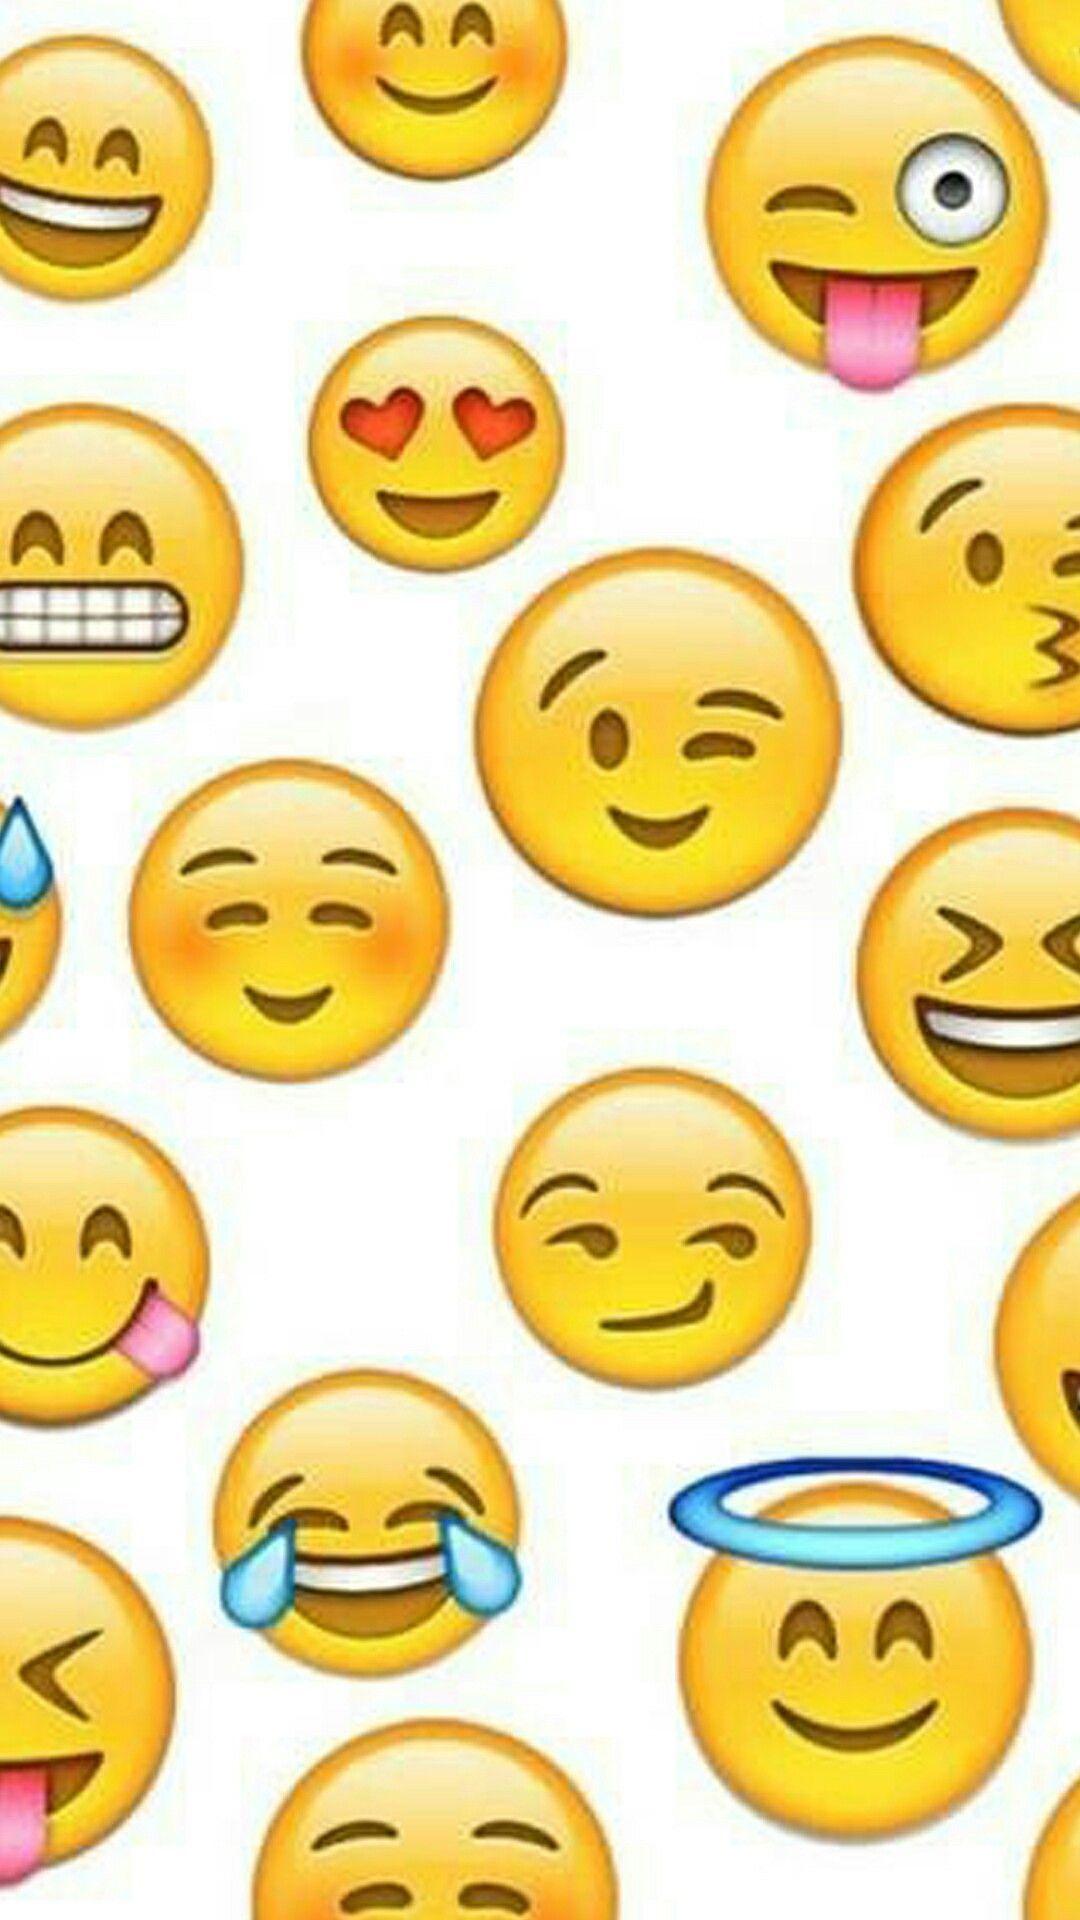 Emoji Wallpaper Hd Resolution » Hupages » Download Iphone